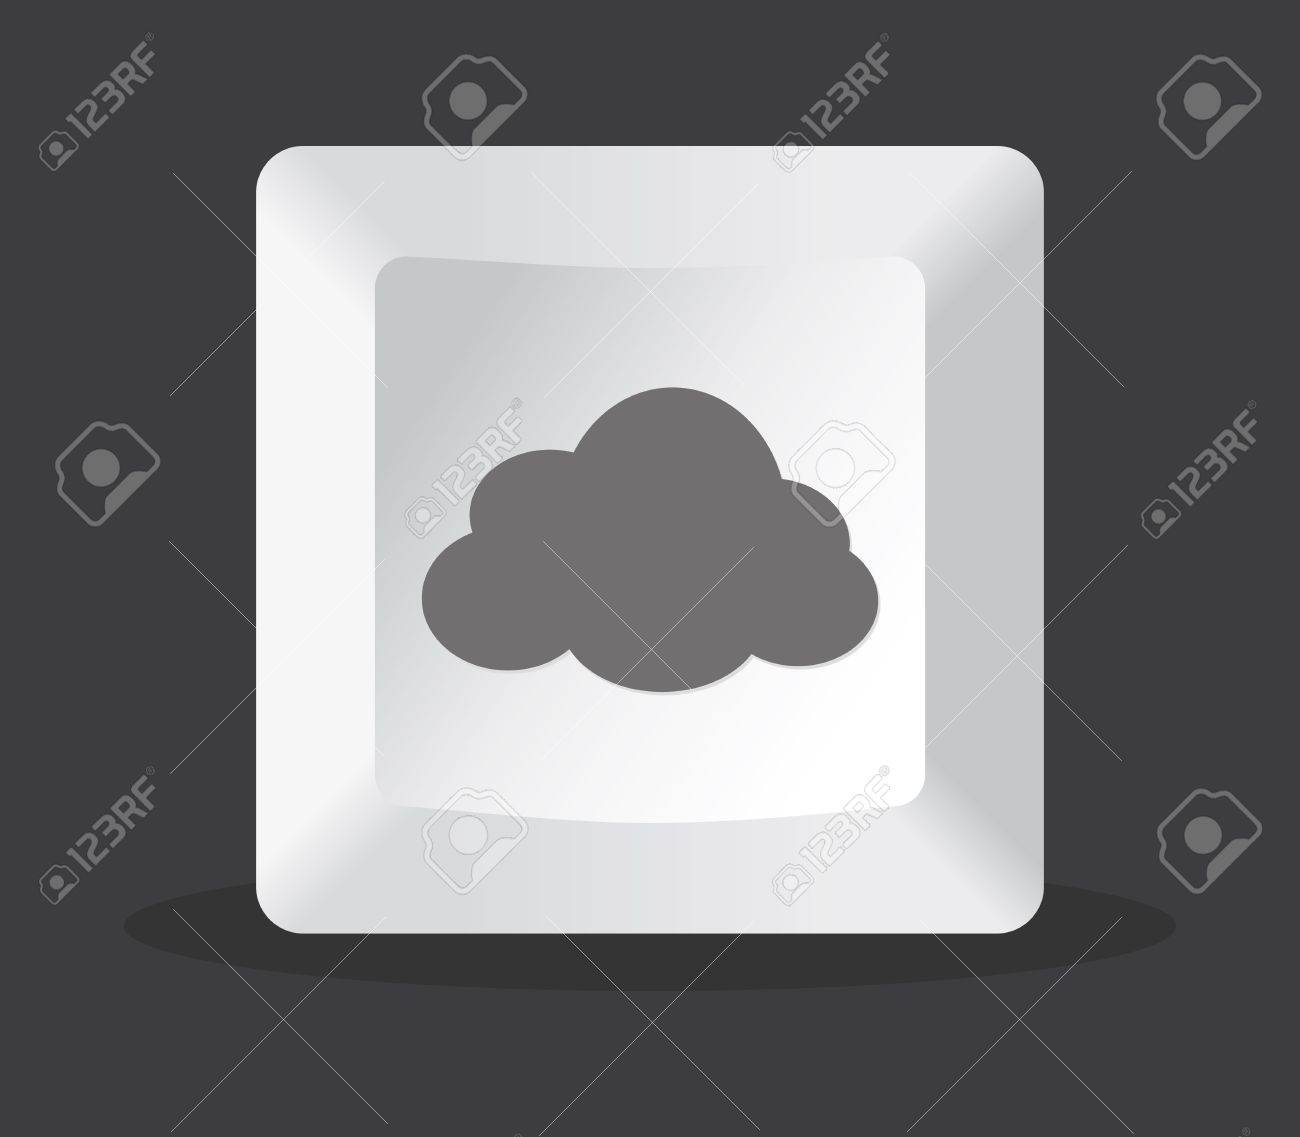 cloud key computer in black background Stock Vector - 9319695